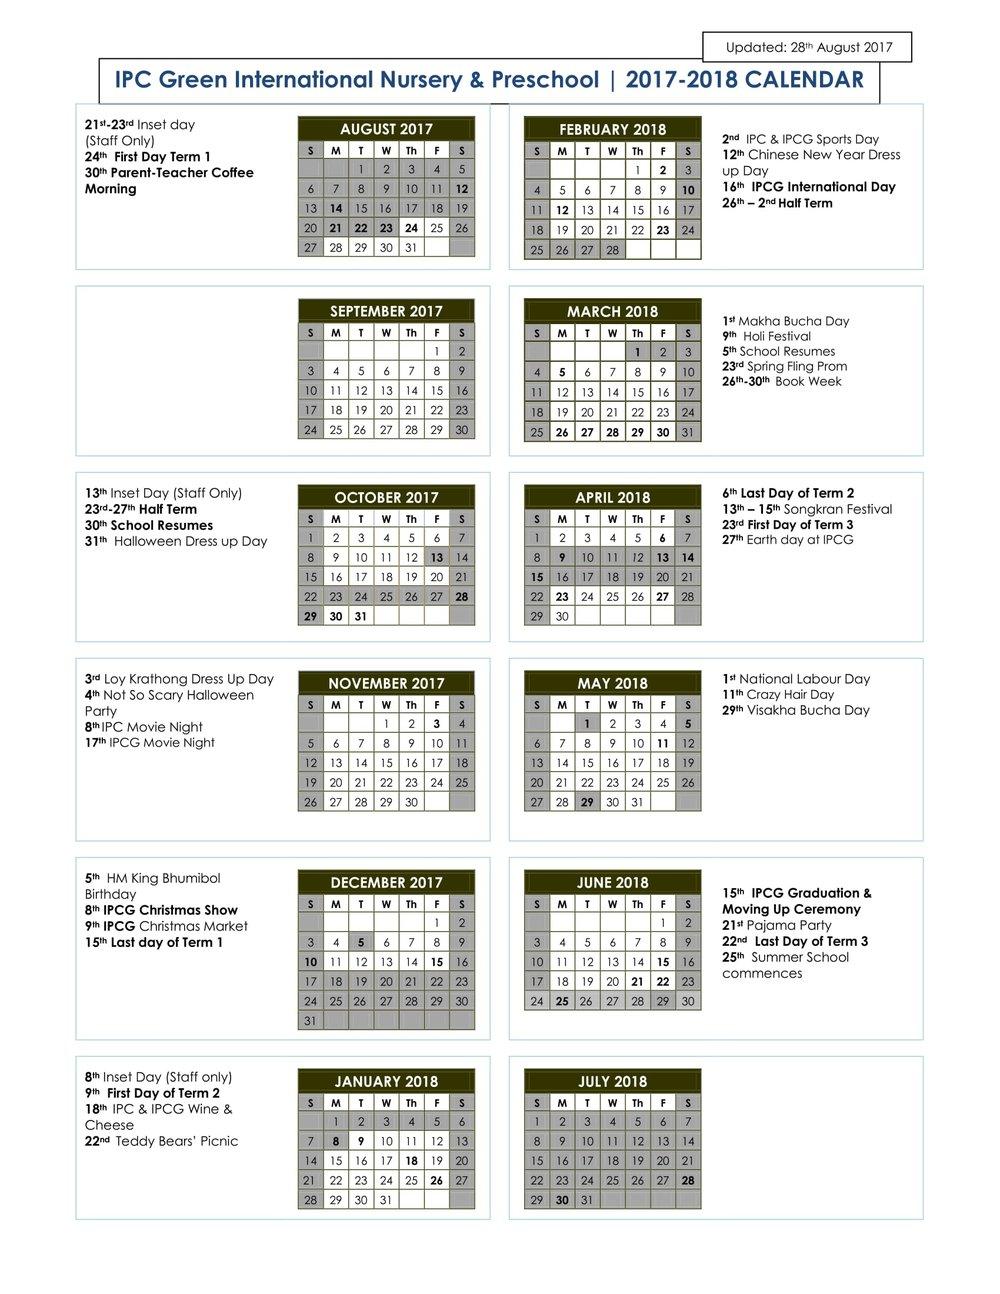 IPC Green 2017-2018 Calendarjpg